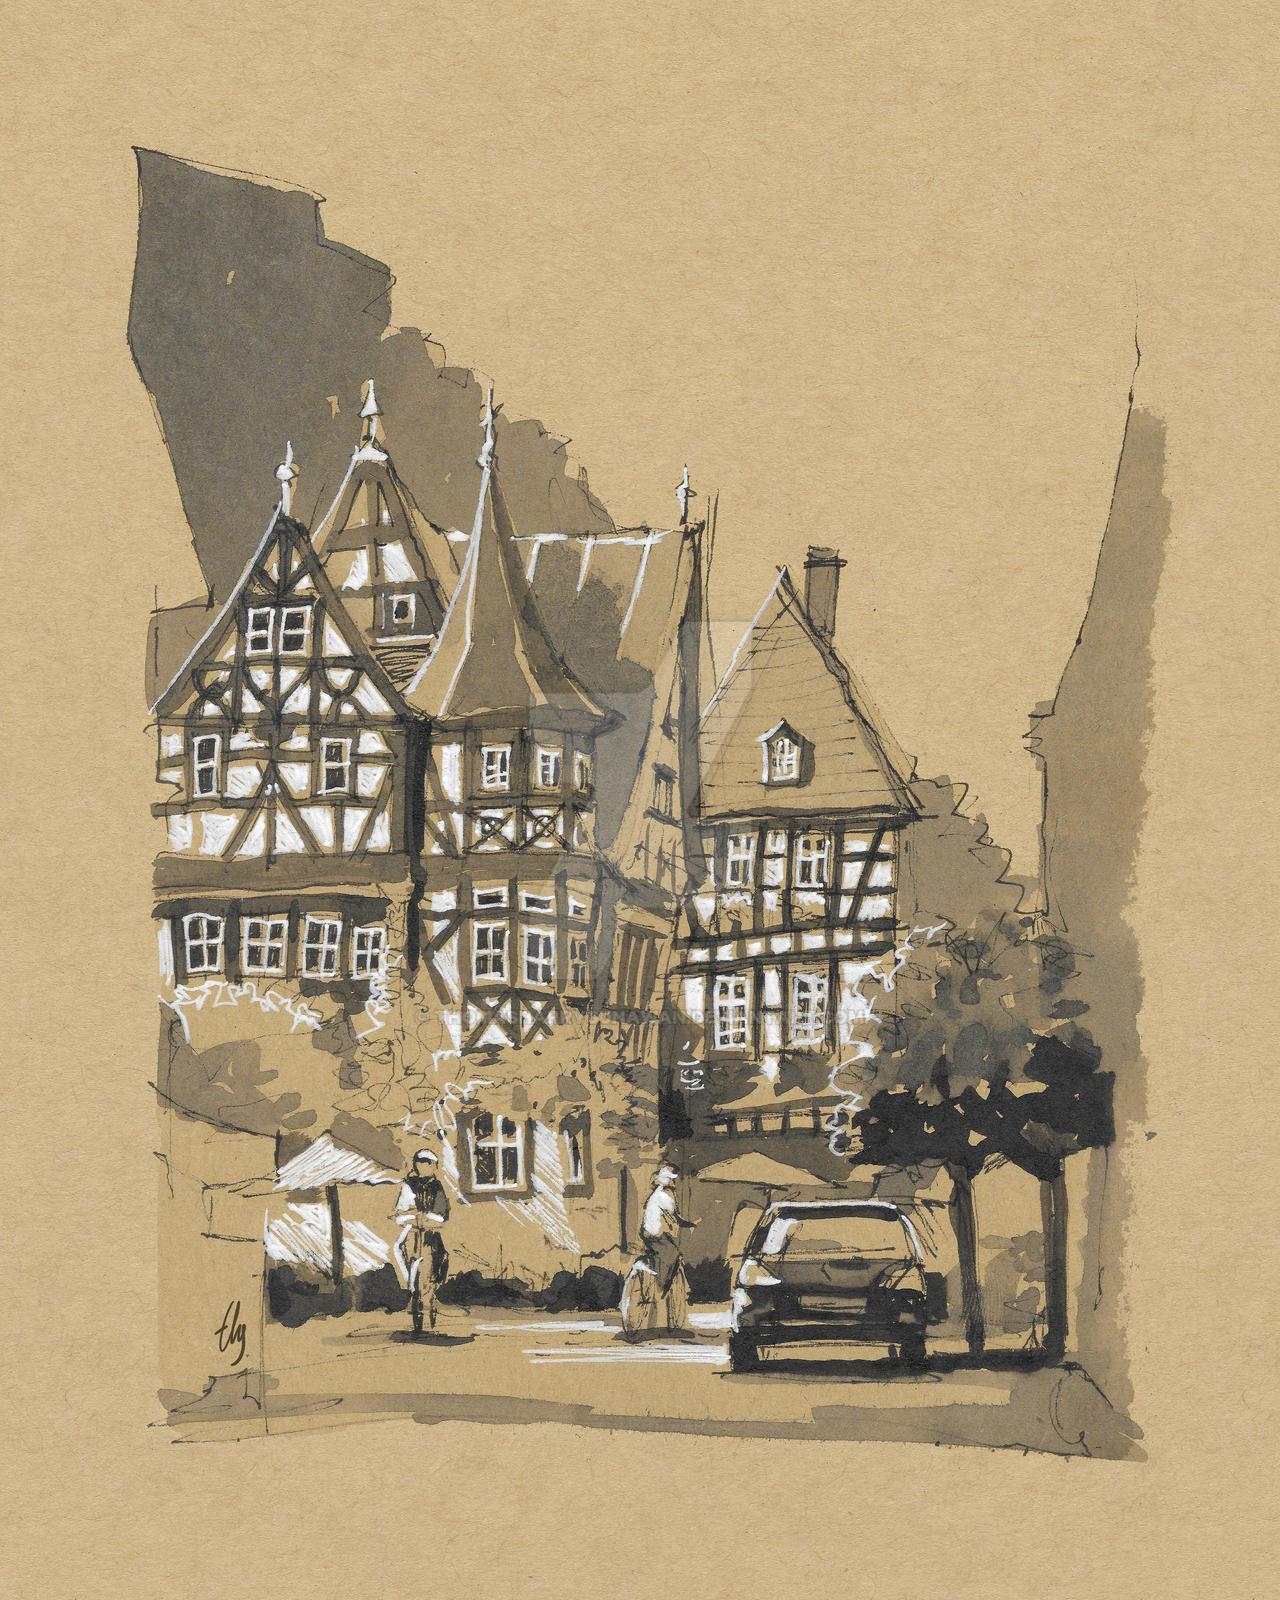 Bacharach Town, Germany